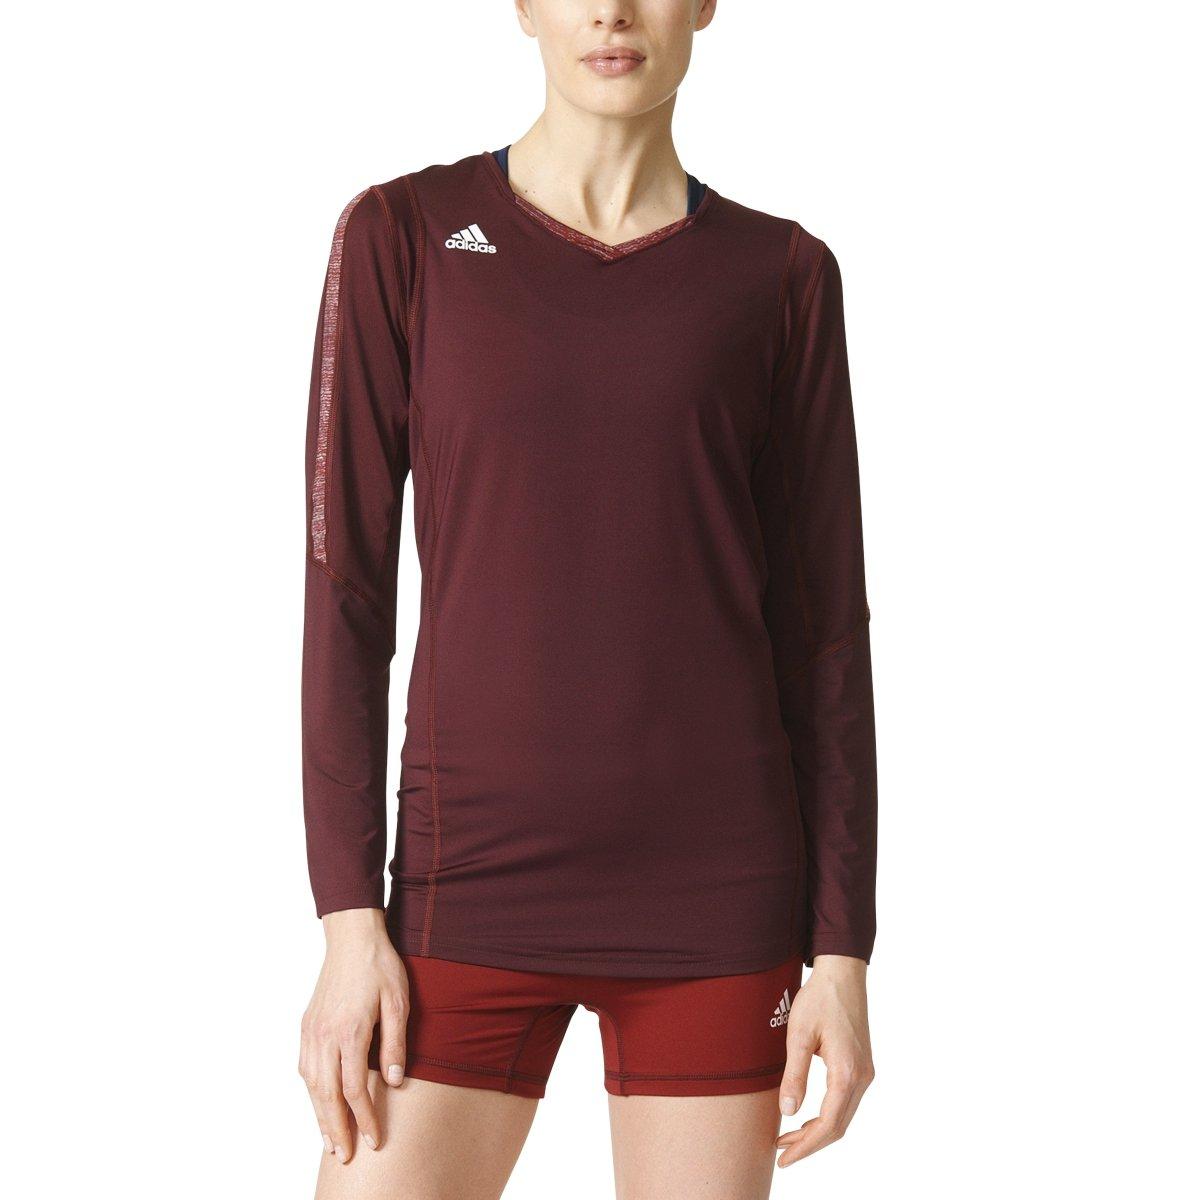 03085f9f Amazon.com : adidas Women's Volleyball Quickset Long Sleeve Jersey :  Clothing